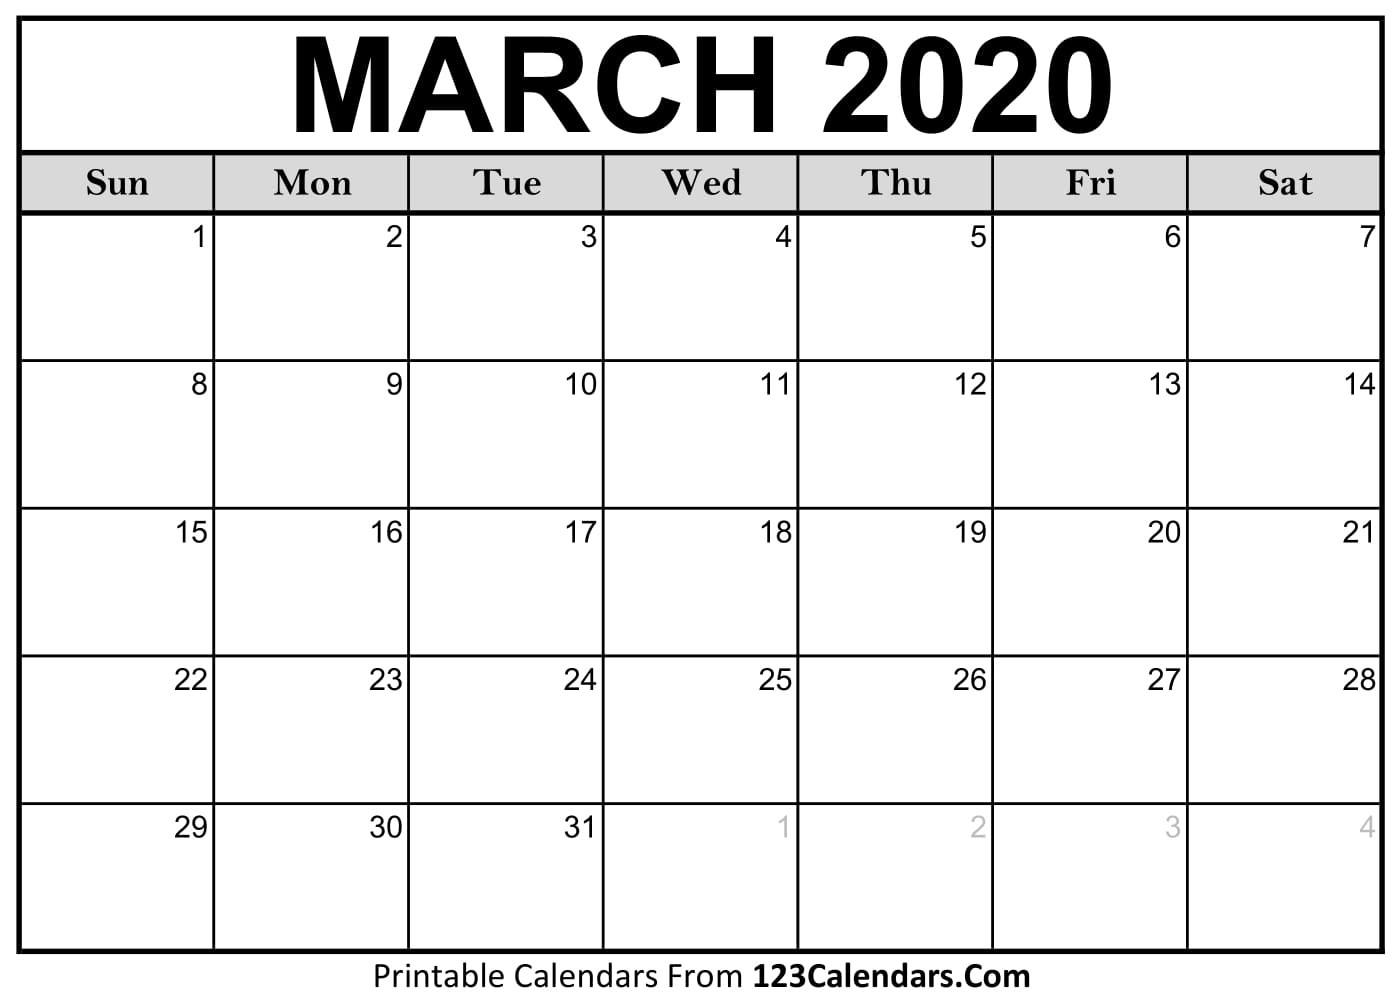 March 2020 Printable Calendar | 123Calendars-Blank 2020 Calendar Month By Month